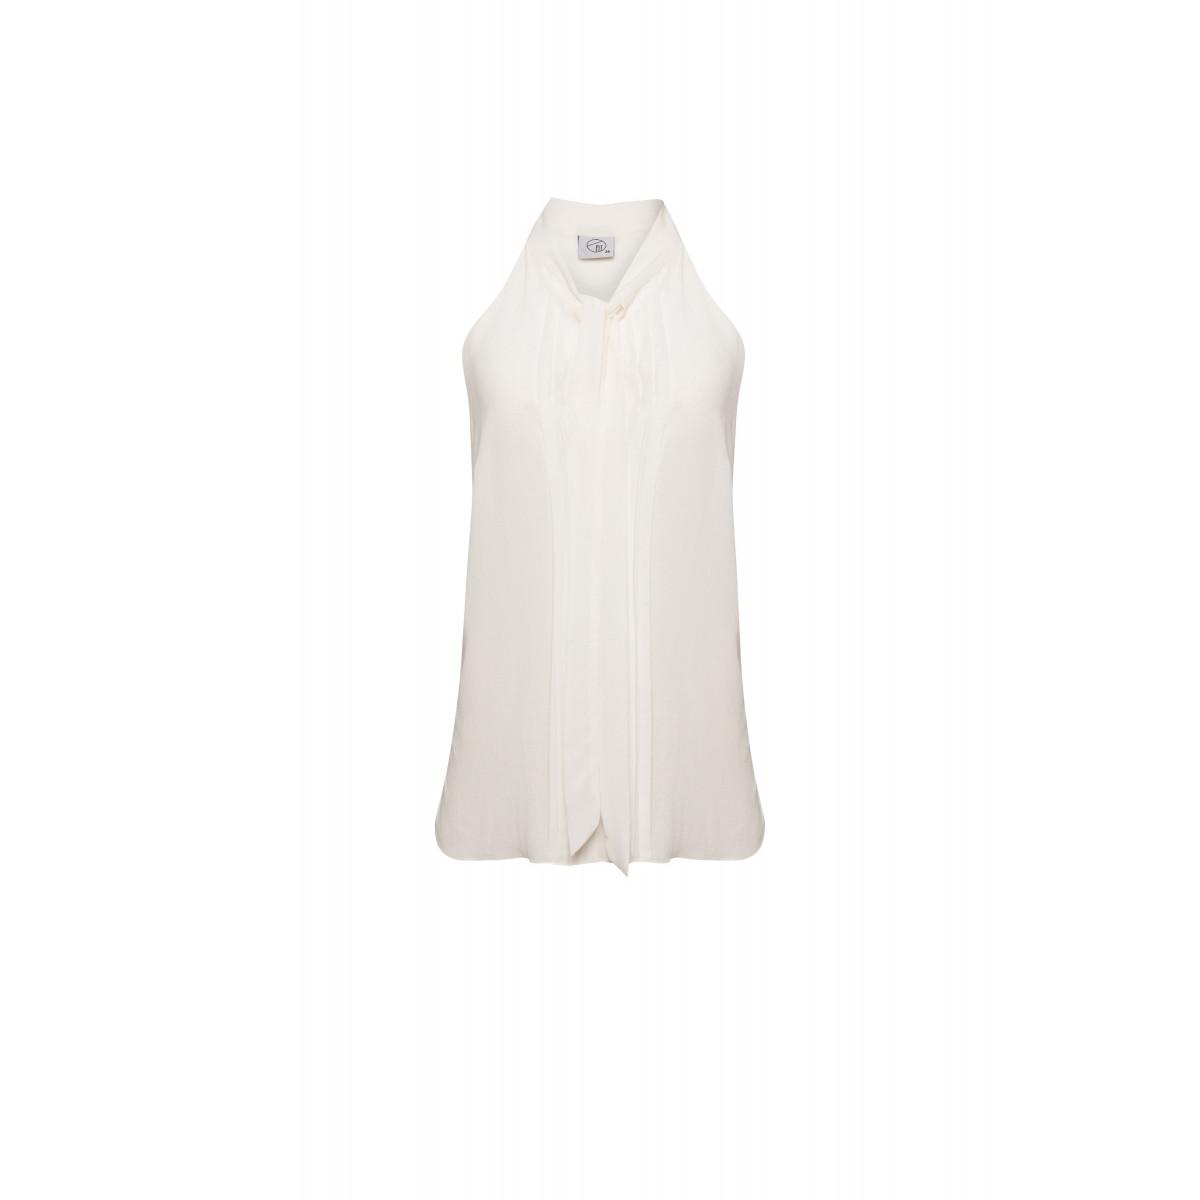 7a04dbb7a0 regata seda lavada laço gola - Camisetas